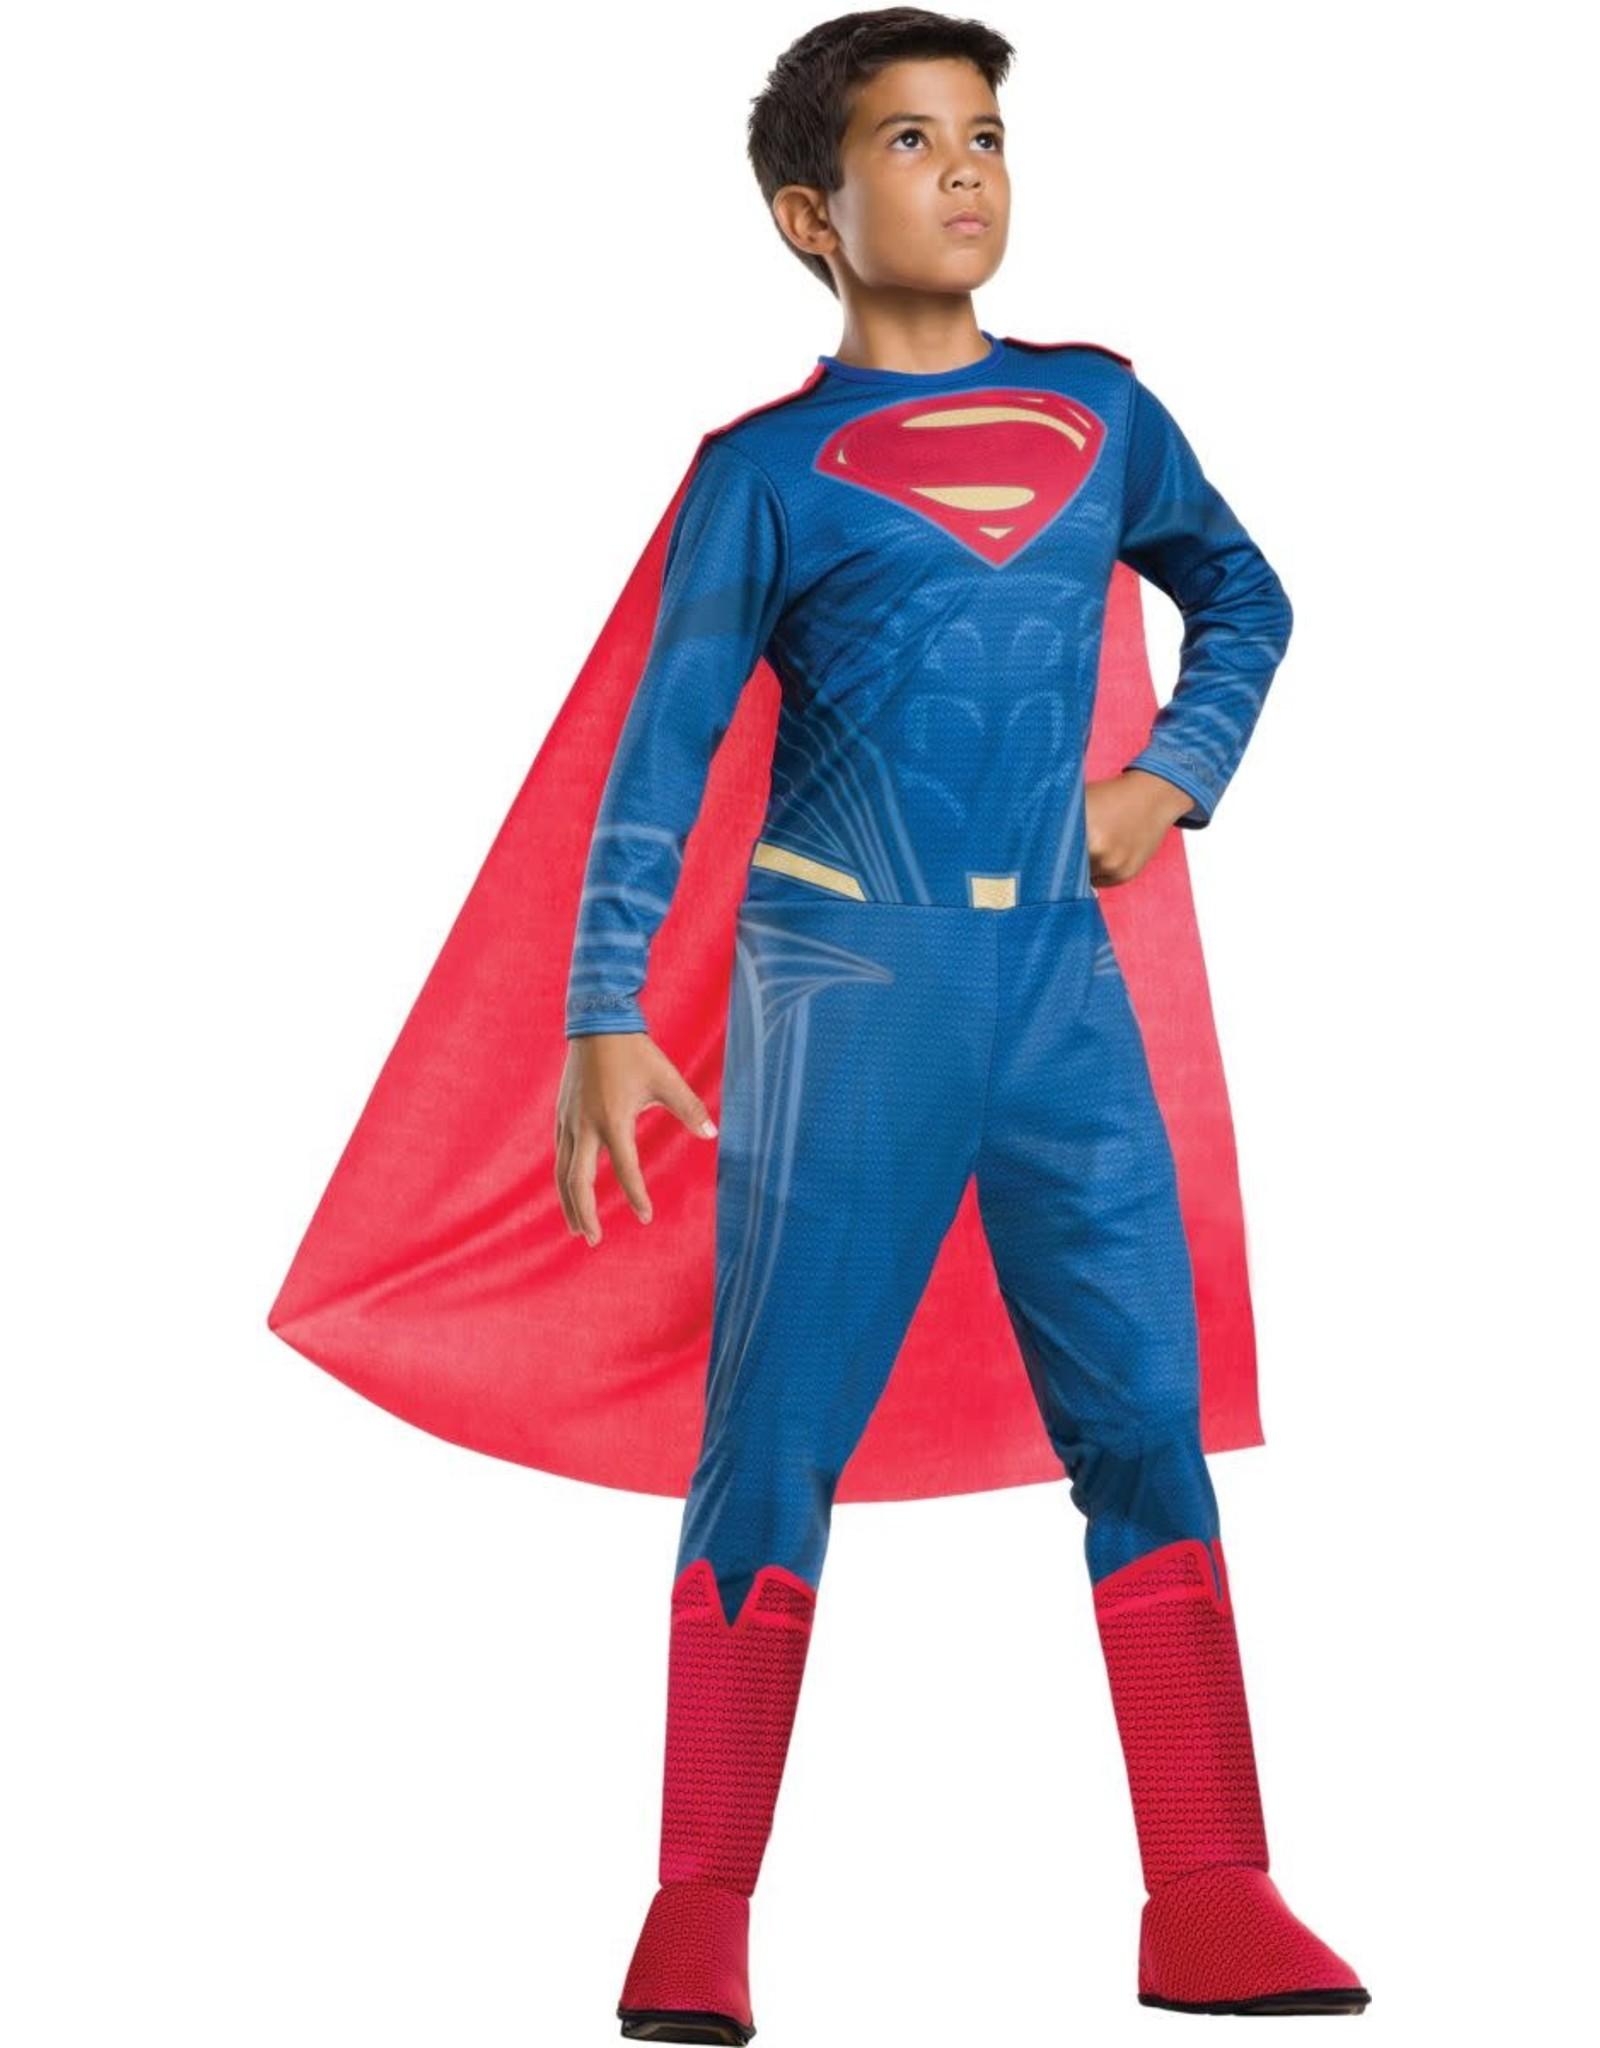 Rubies Costume Children's Superman - Justice League